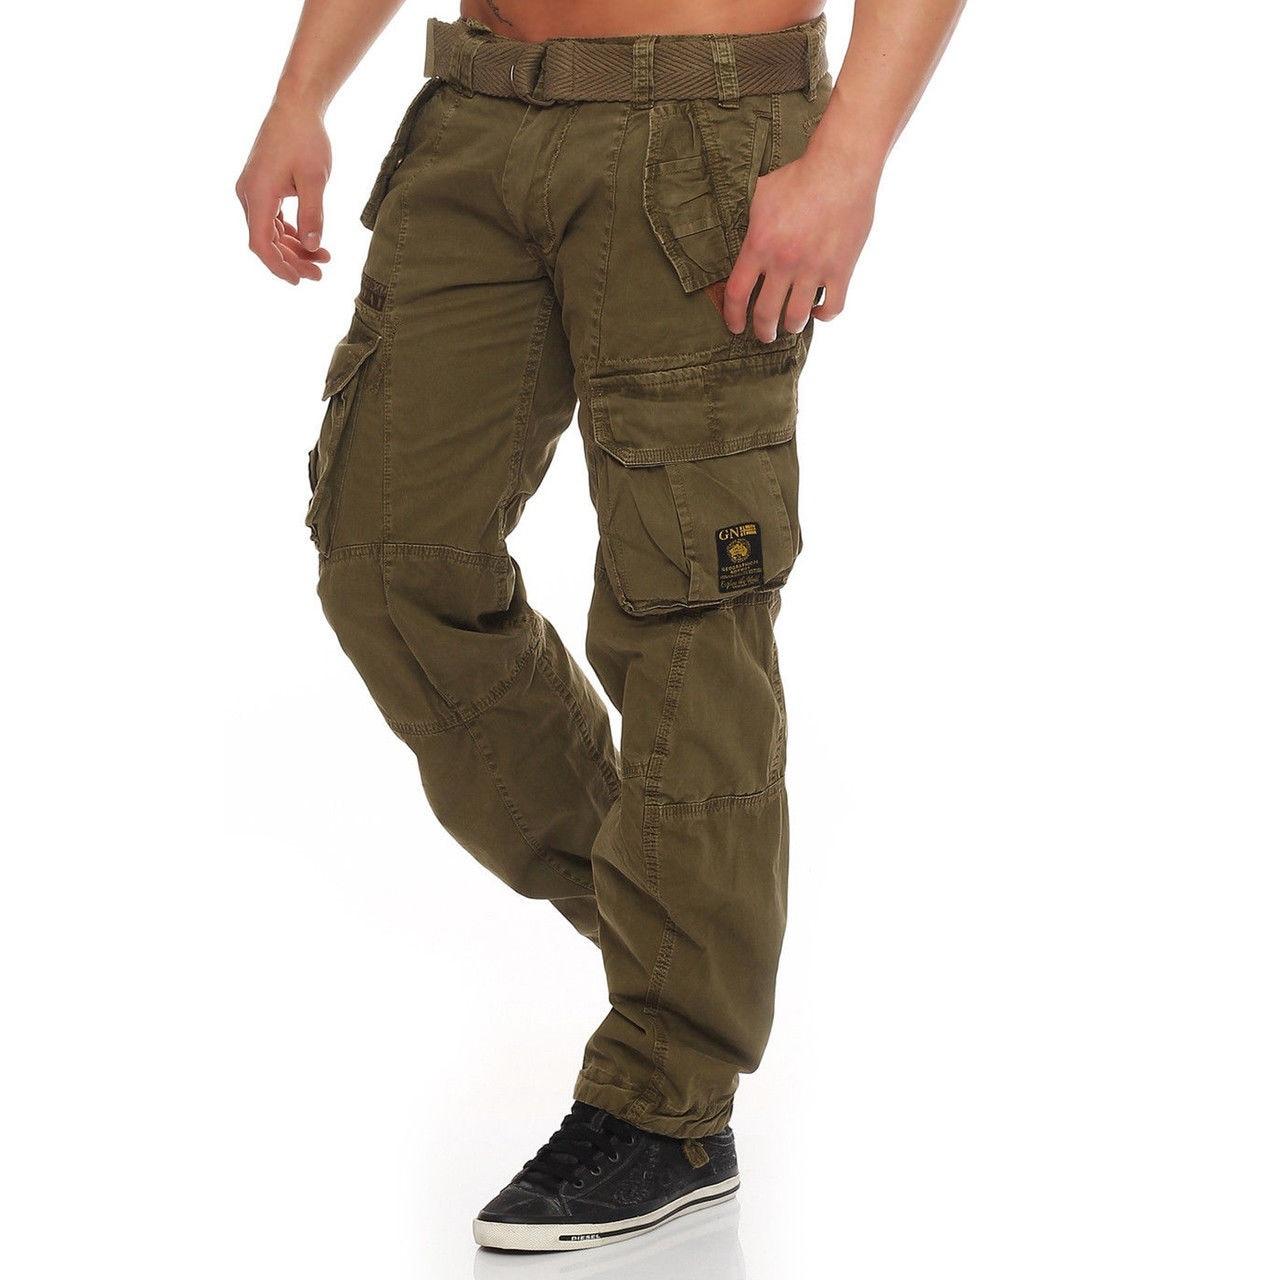 Cotton Traders Mens Adventure Trousers Elasticated Waist Zip Fastening Fly Lightweight Pants 27 Leg Length